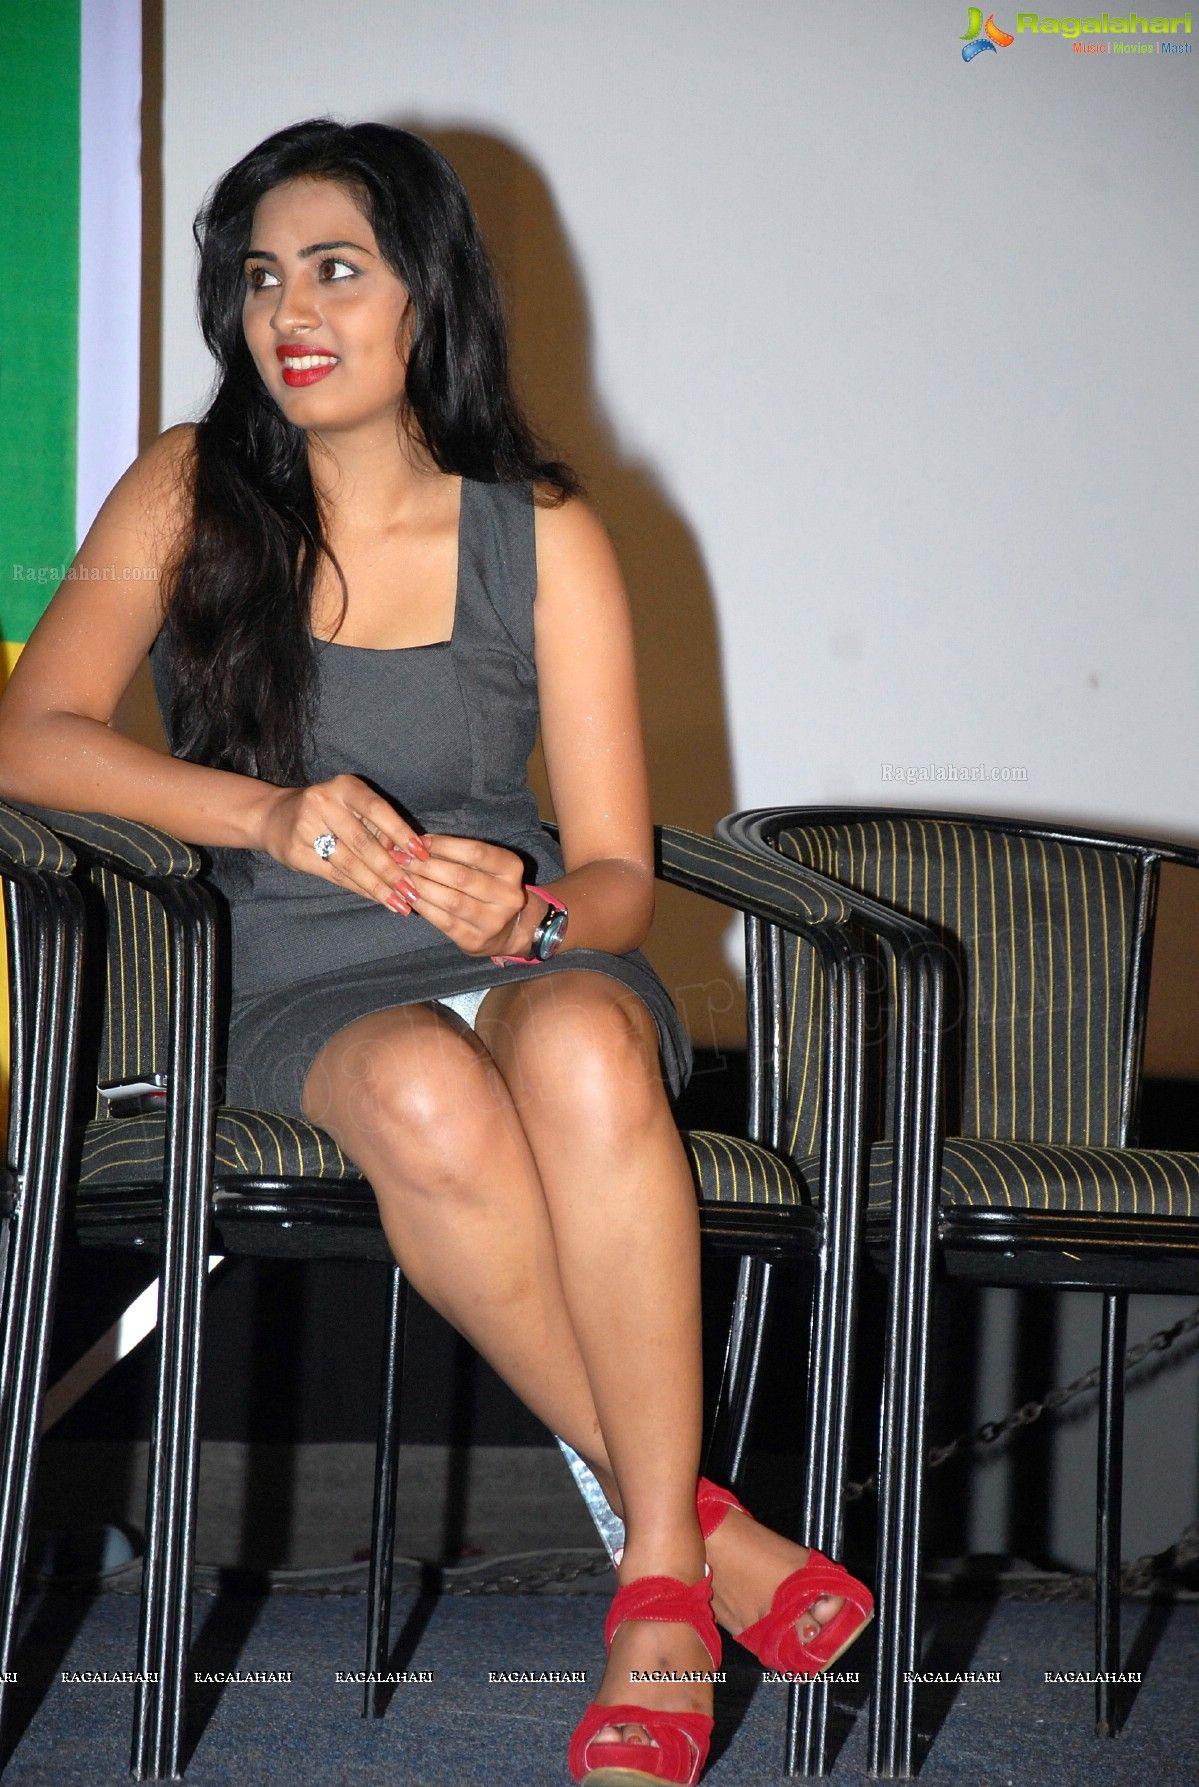 Porn image of rani mukharjee